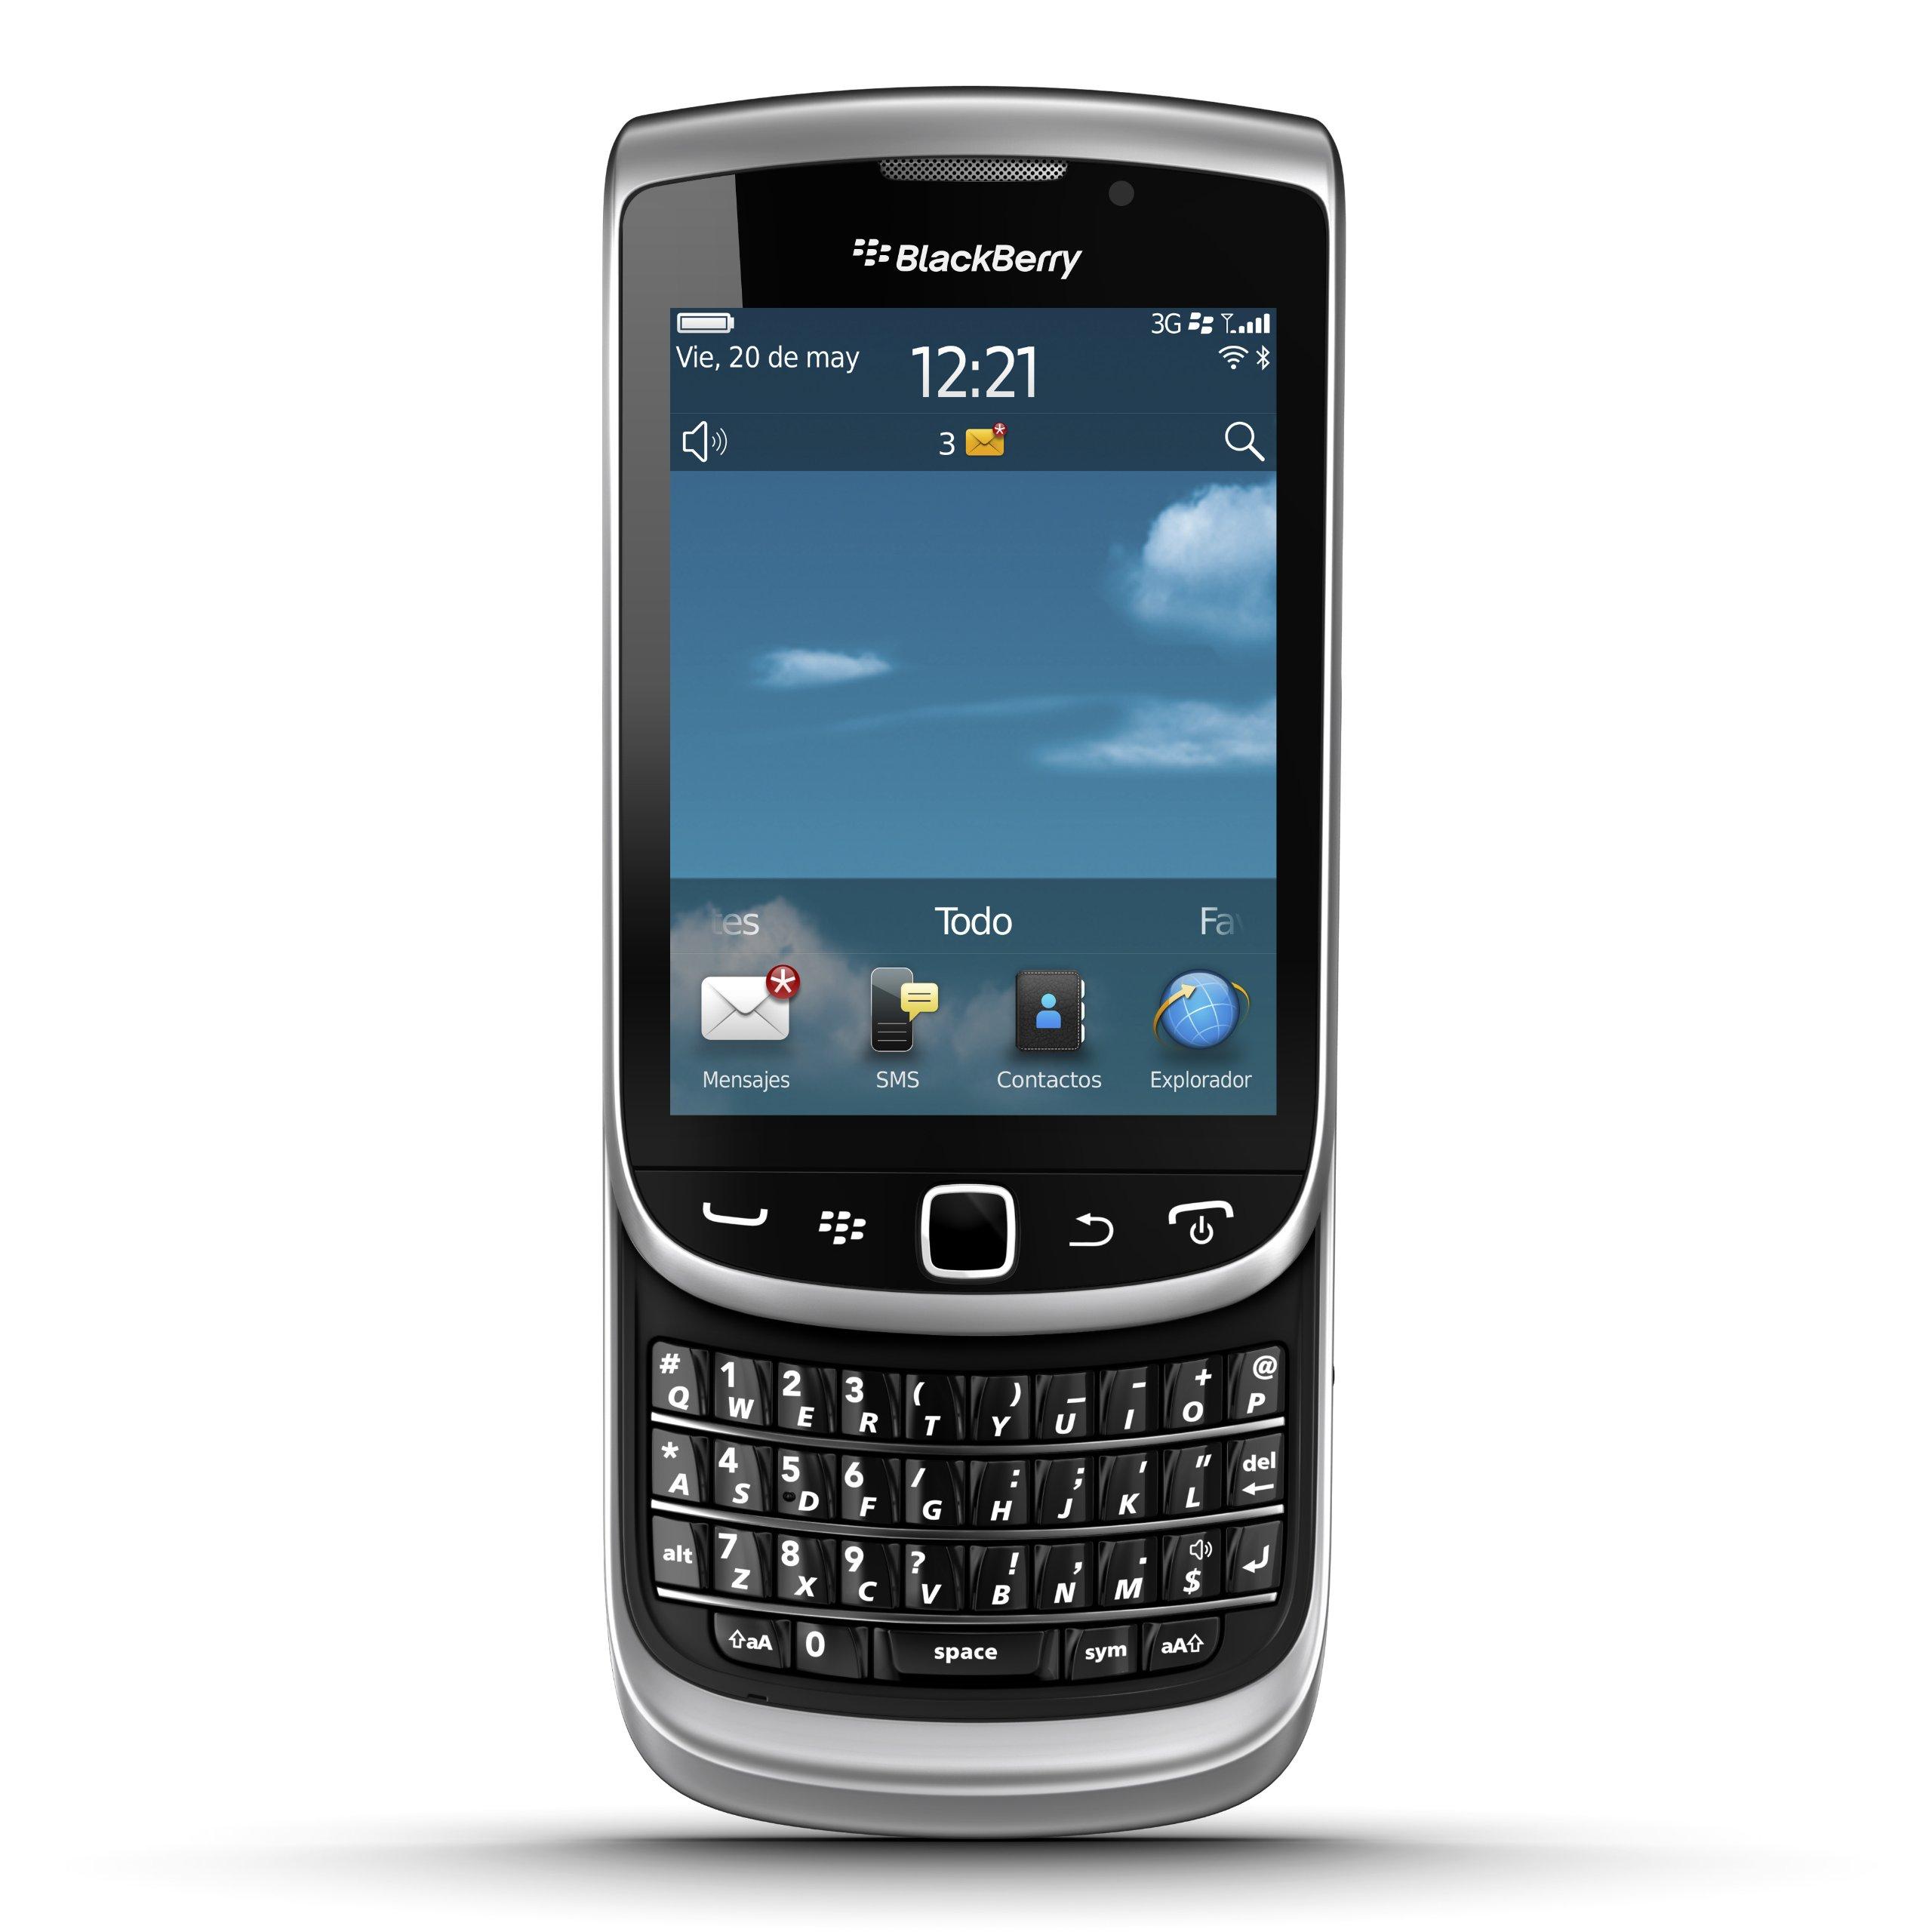 Blackberry Torch 9810 Unlocked GSM HSPA+ OS 7.0 Slider Phone - Zinc Grey